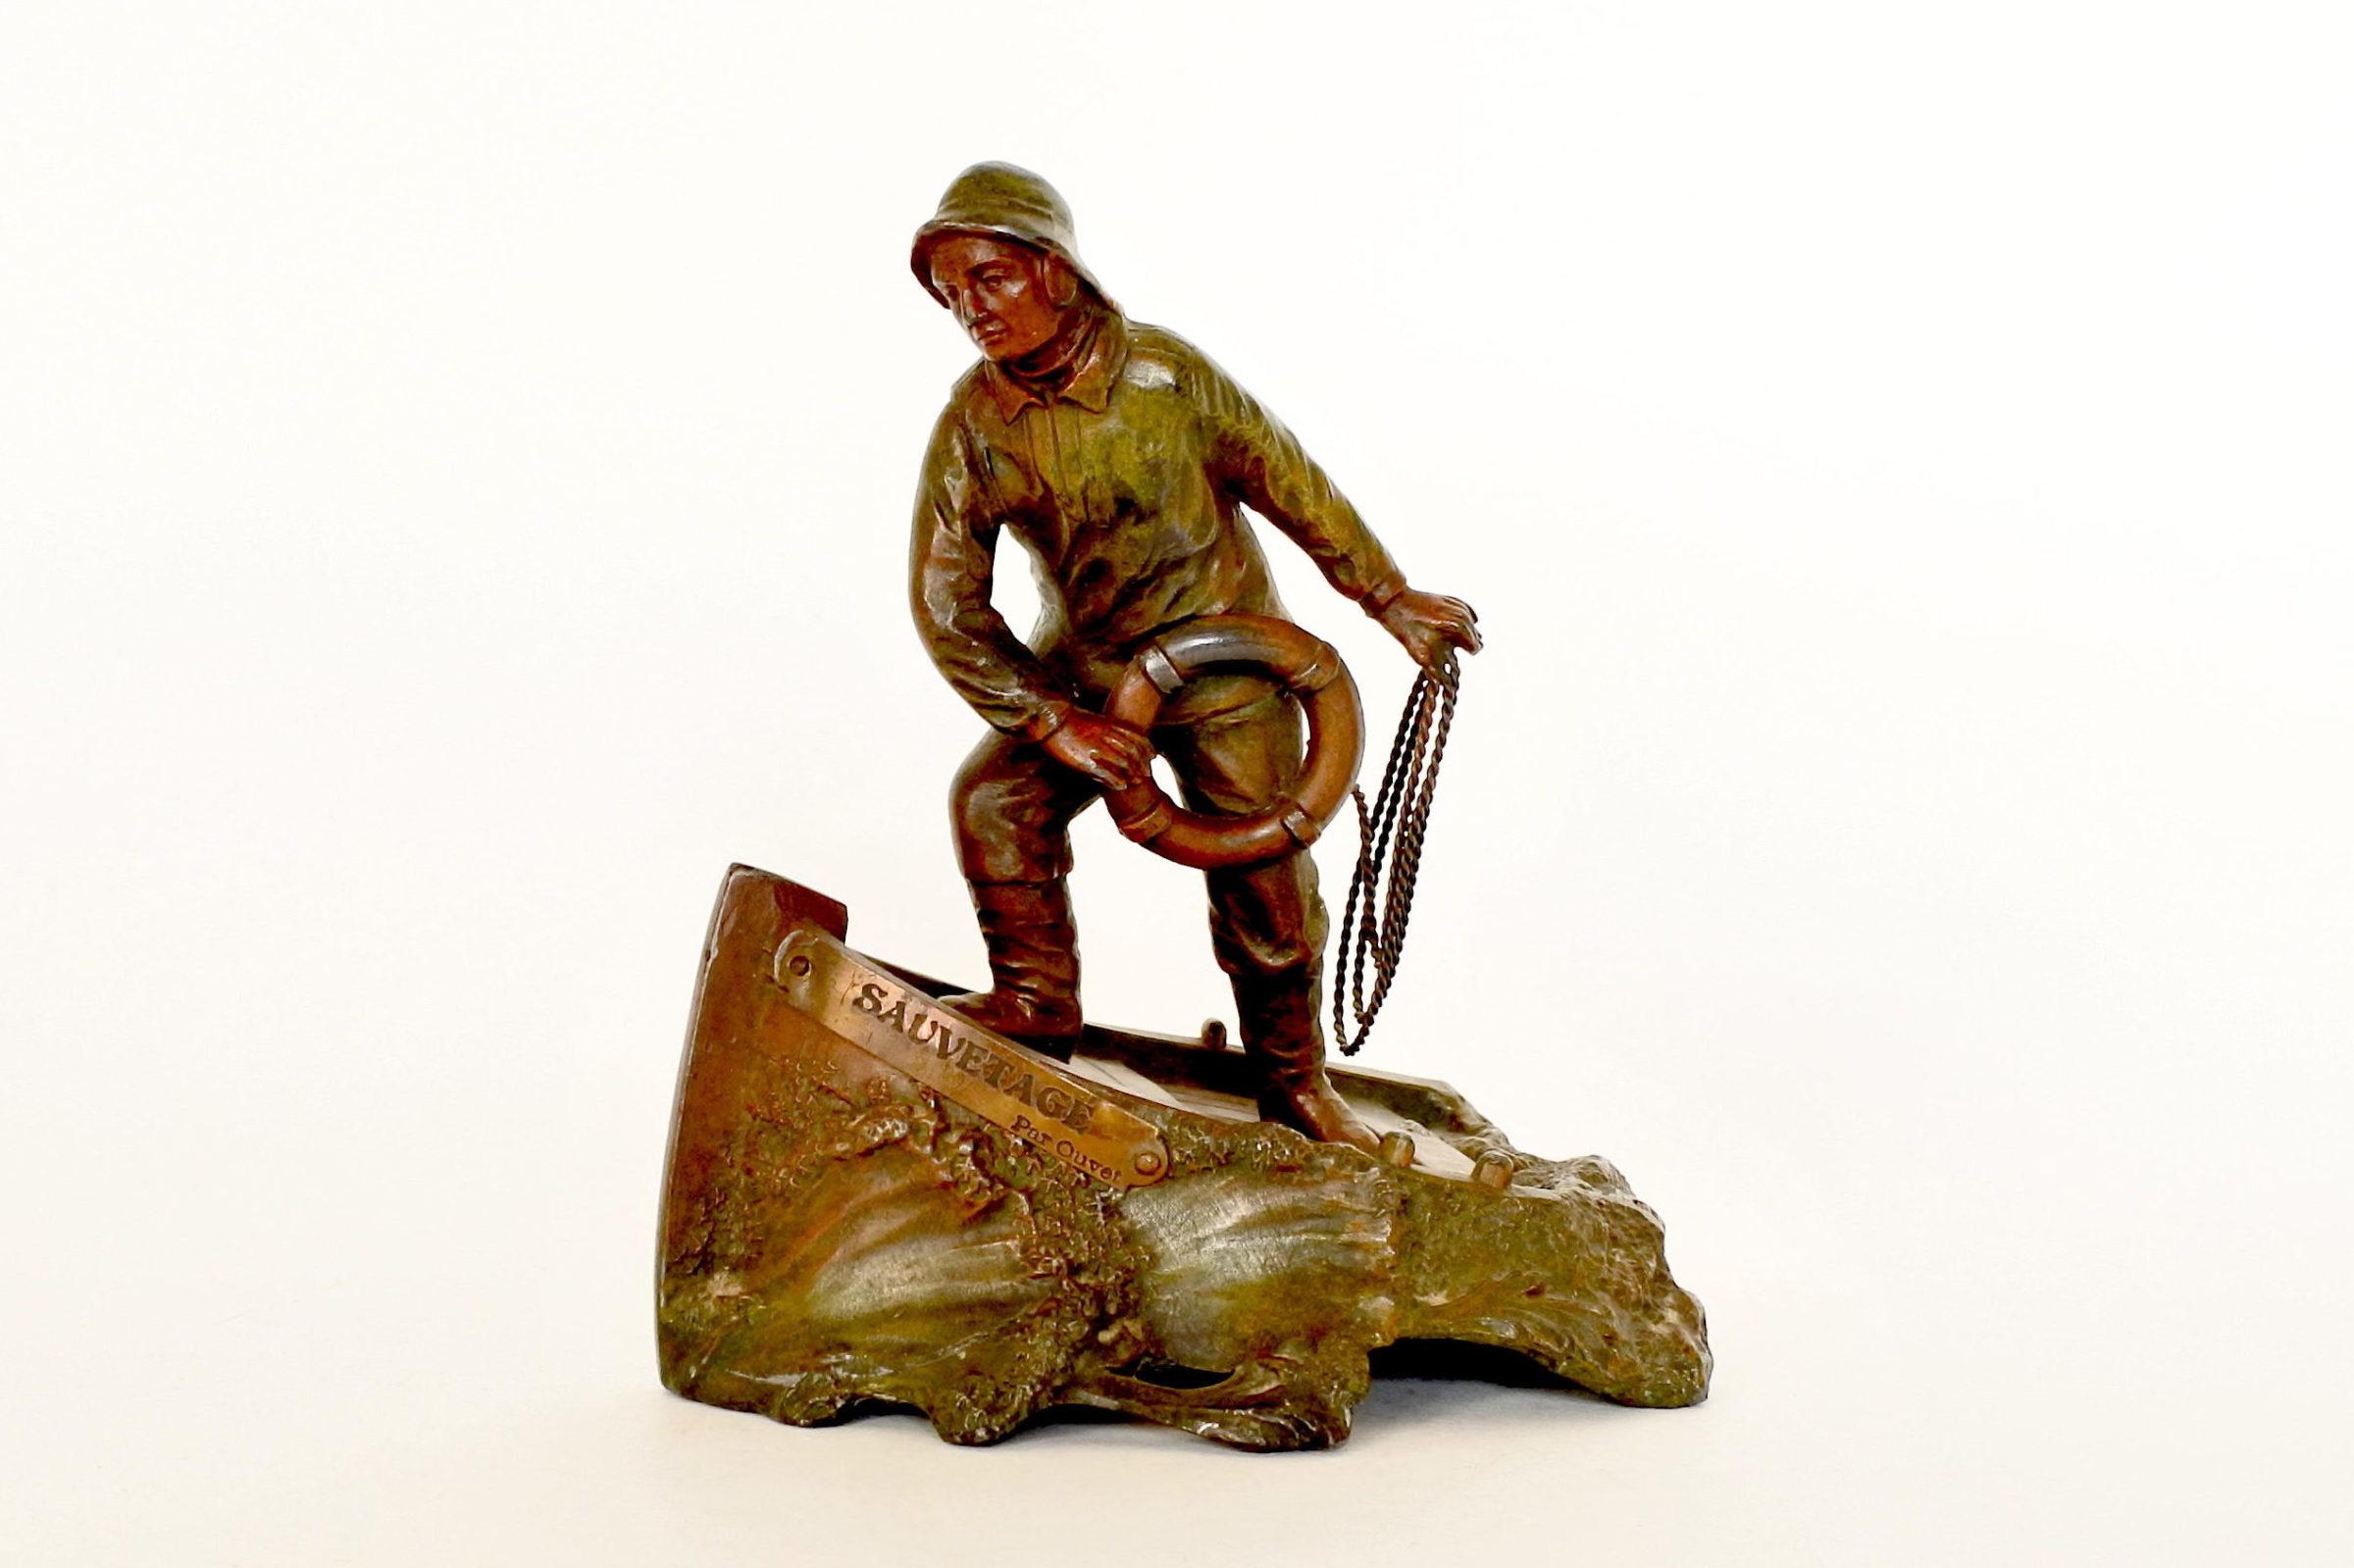 Statuina in bronzo patinato con marinaio - A.Ouvet